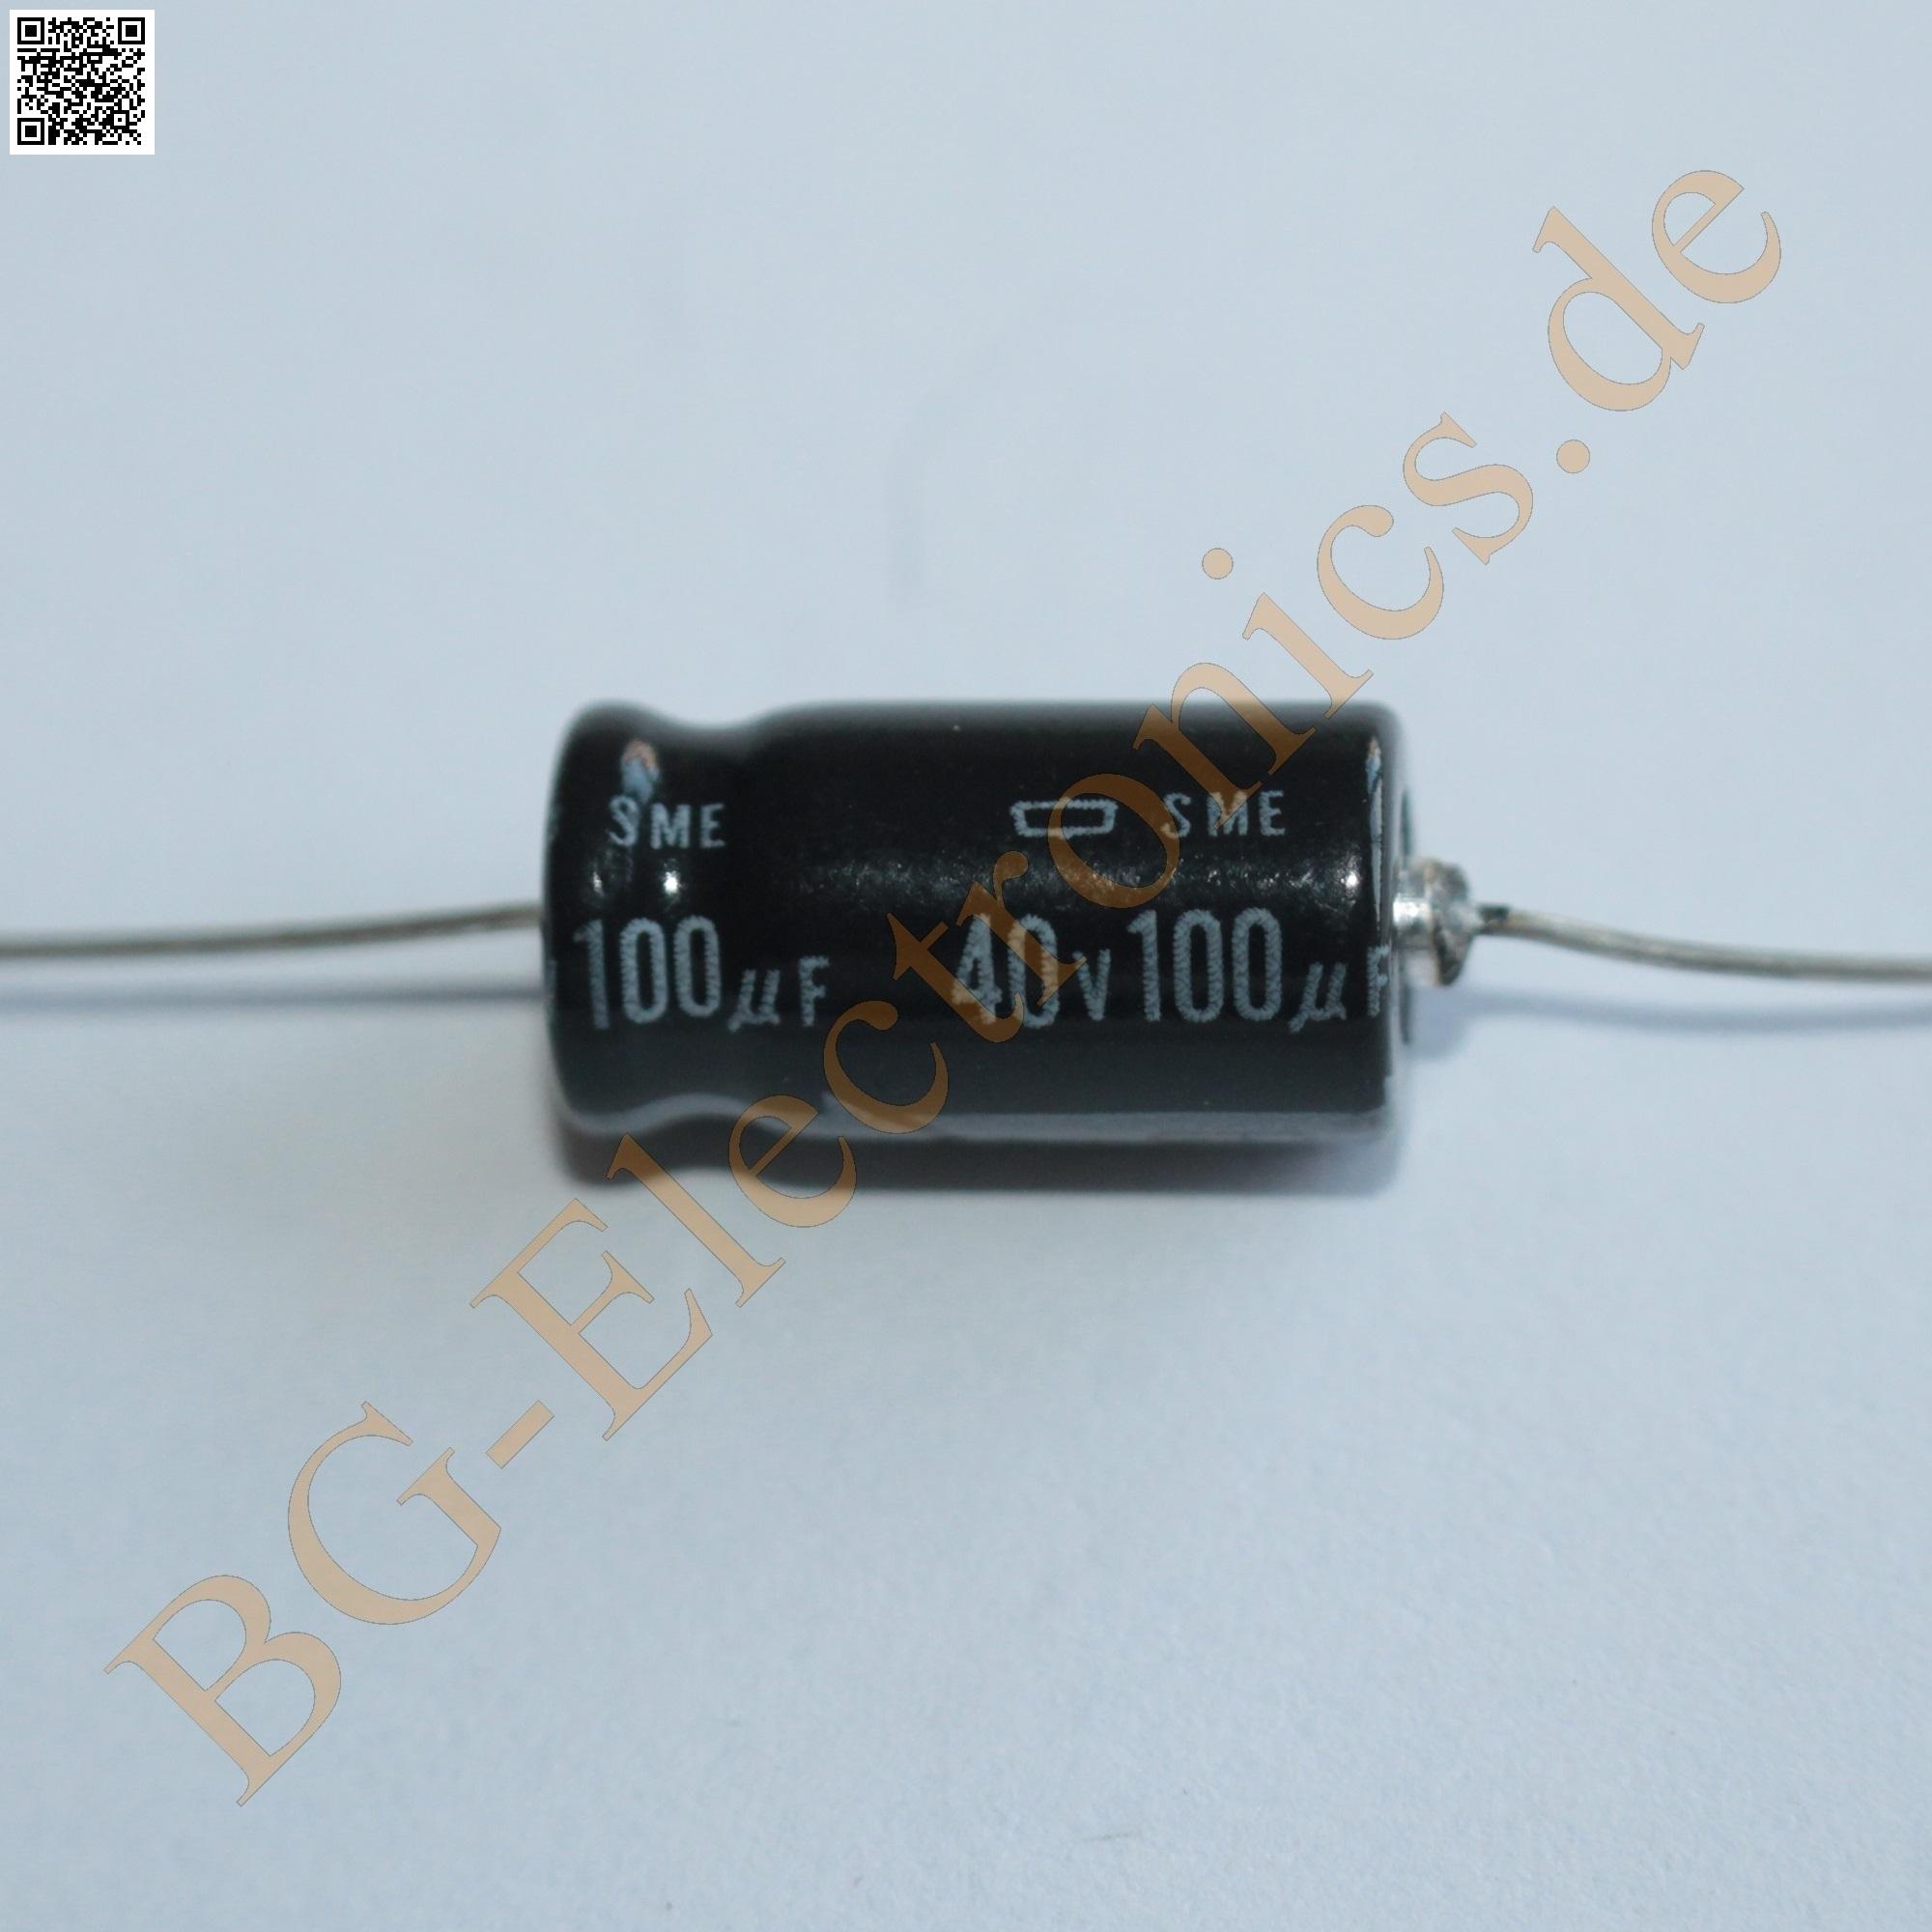 5 x 100µF 100uF 50V 85° Elko Kondensator Capacitor axial Roederste  5pcs